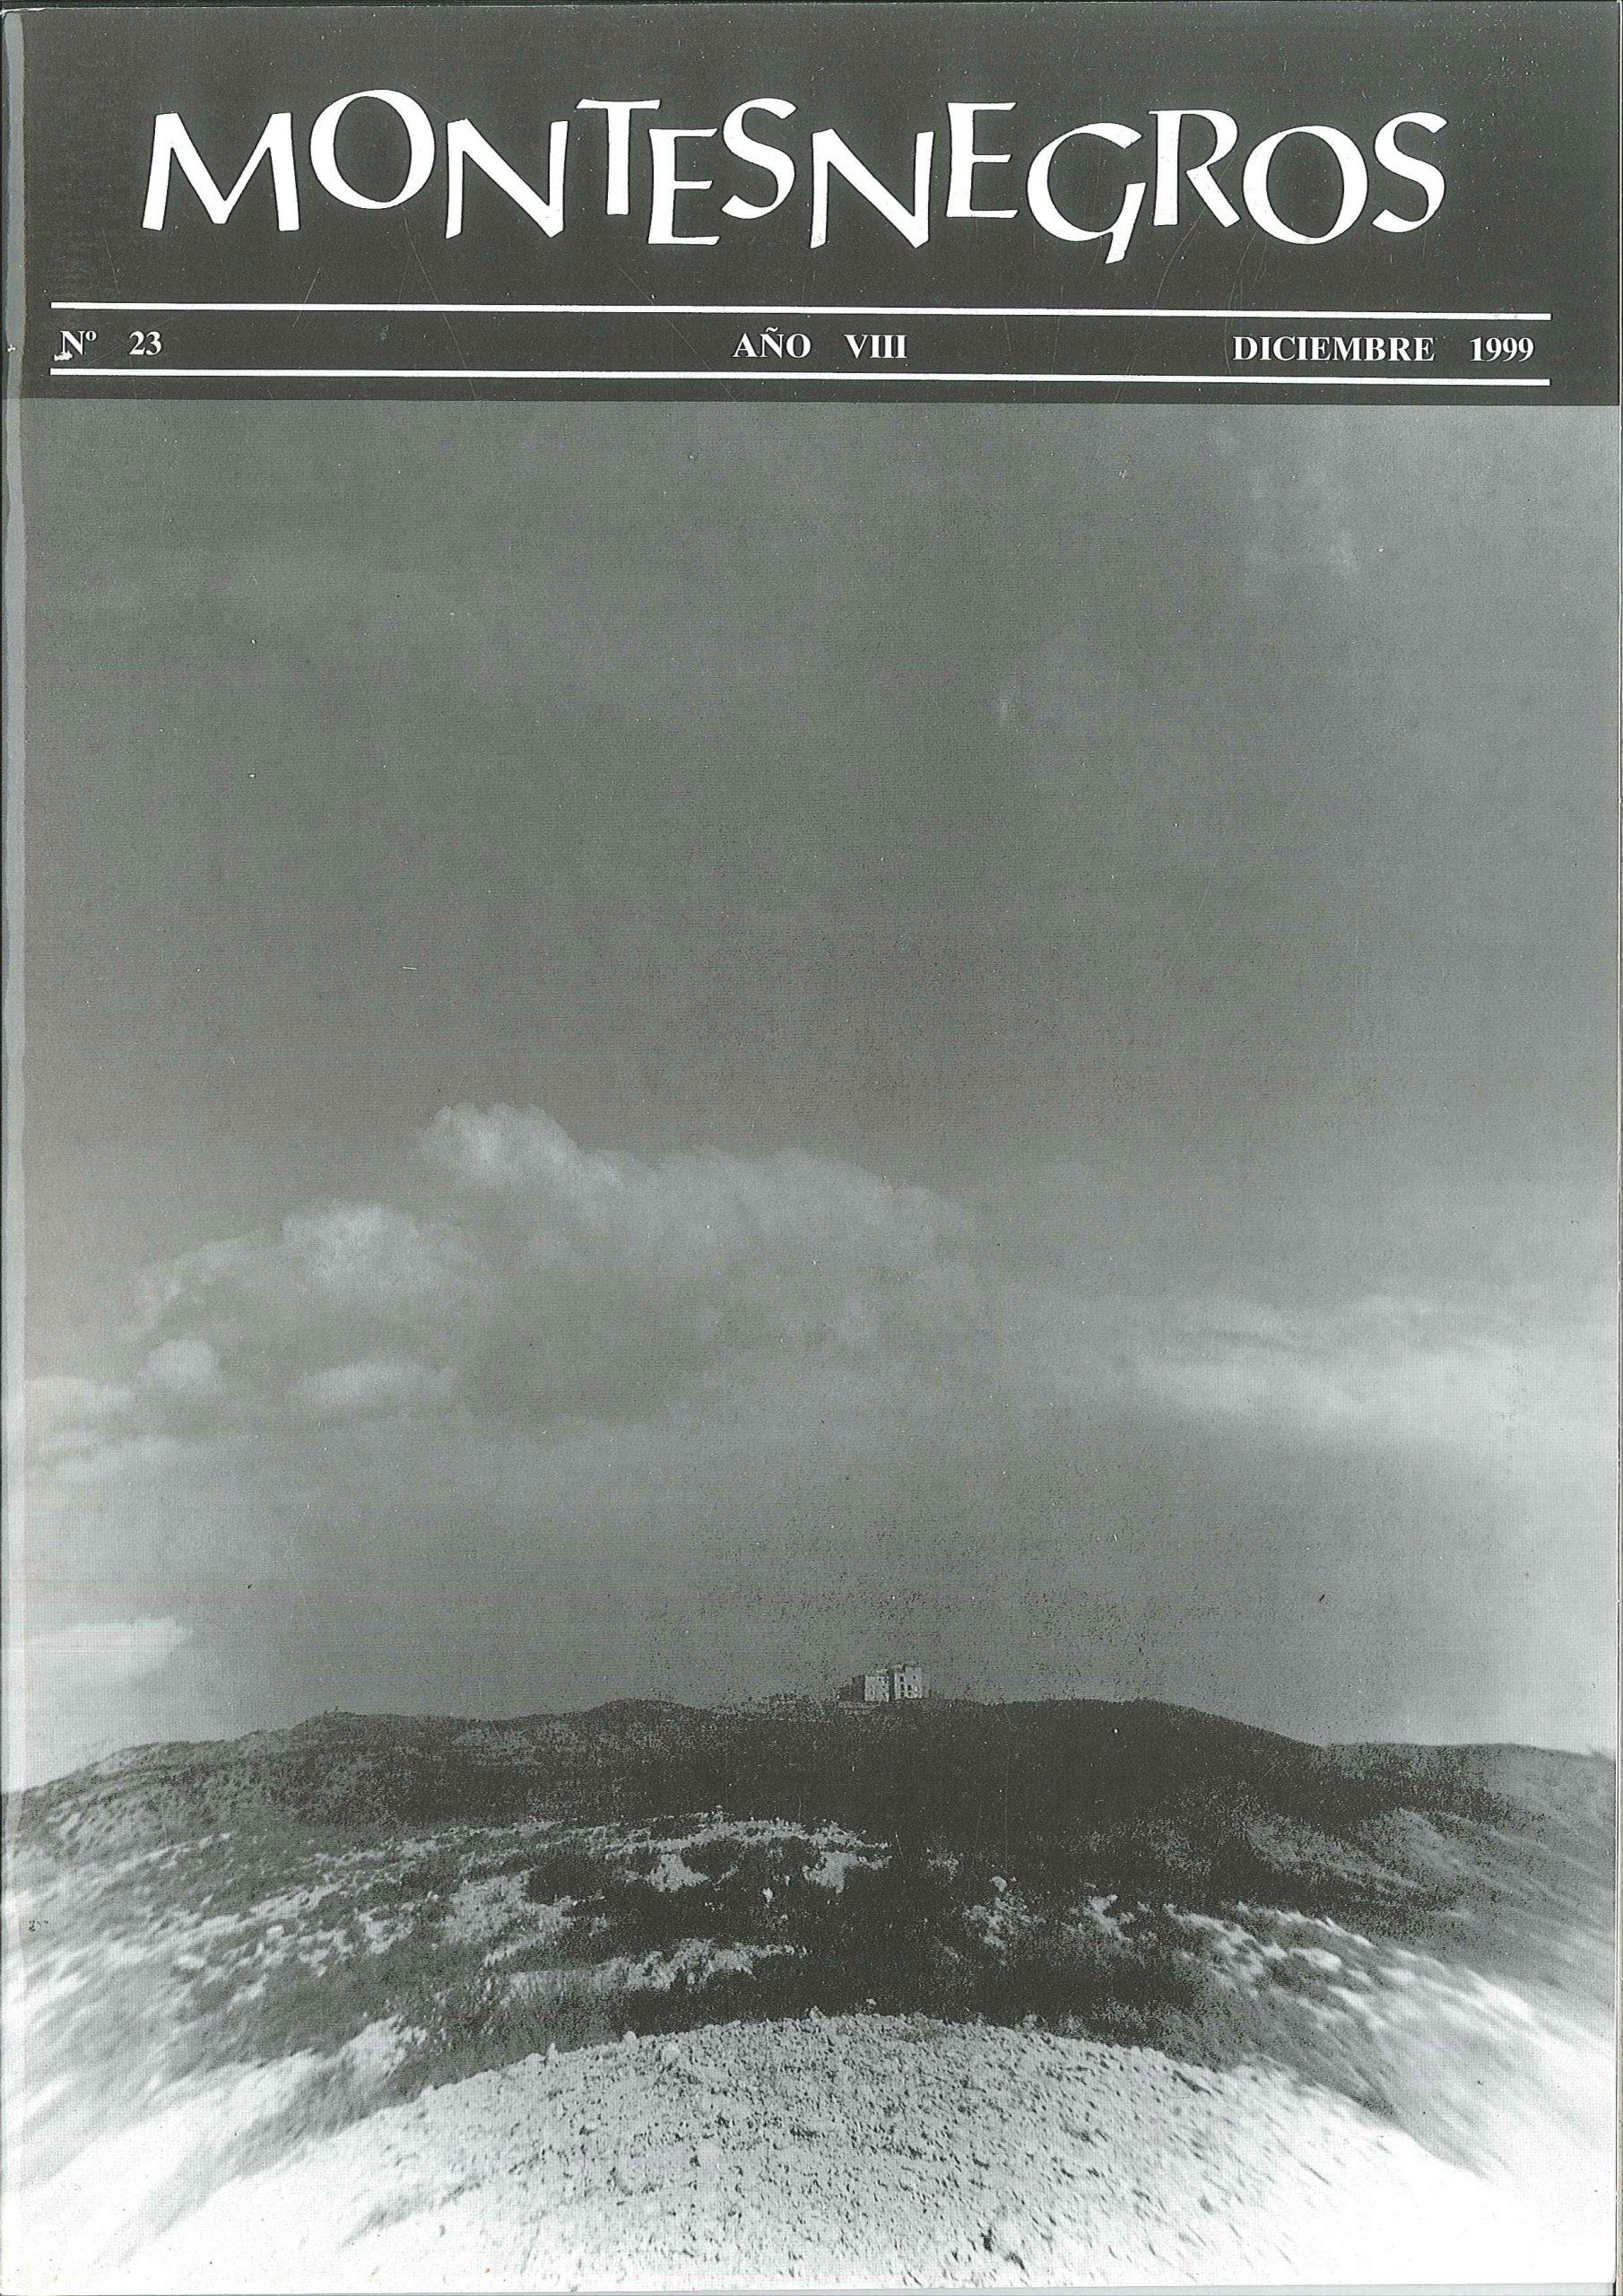 Portada del número 46 de la revista Montesnegros